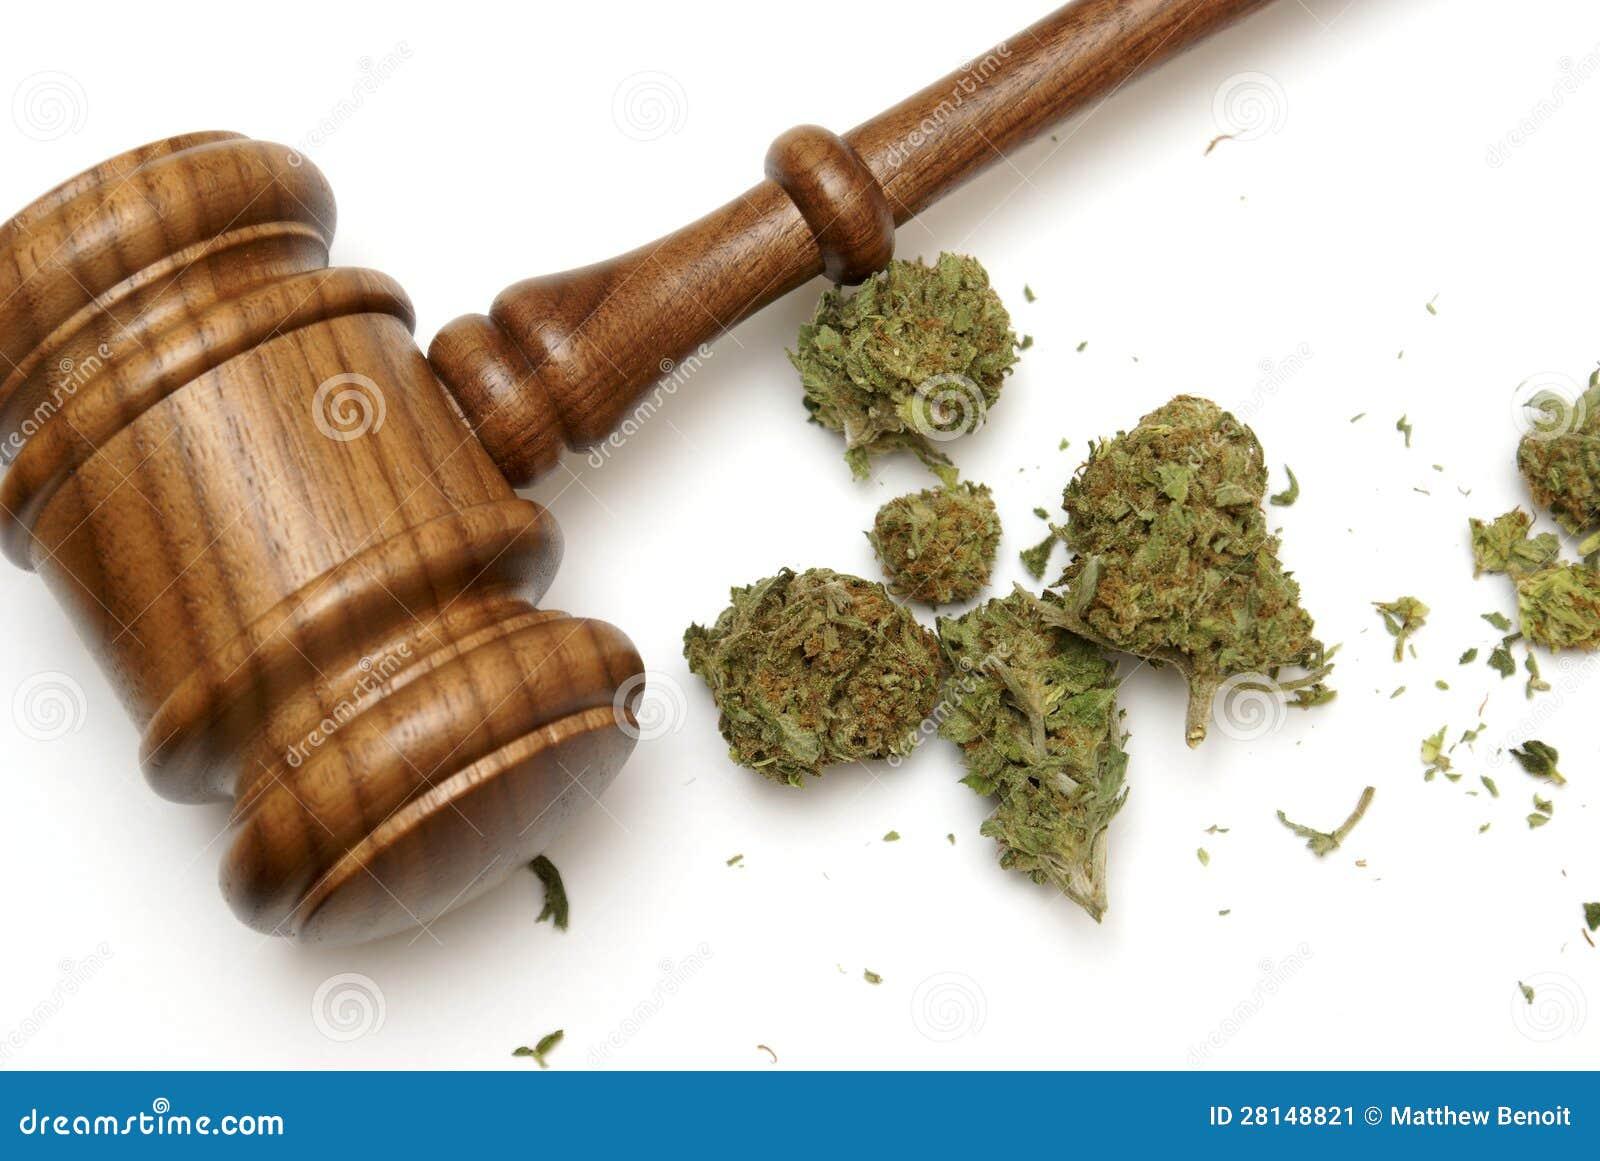 Prawo i marihuana